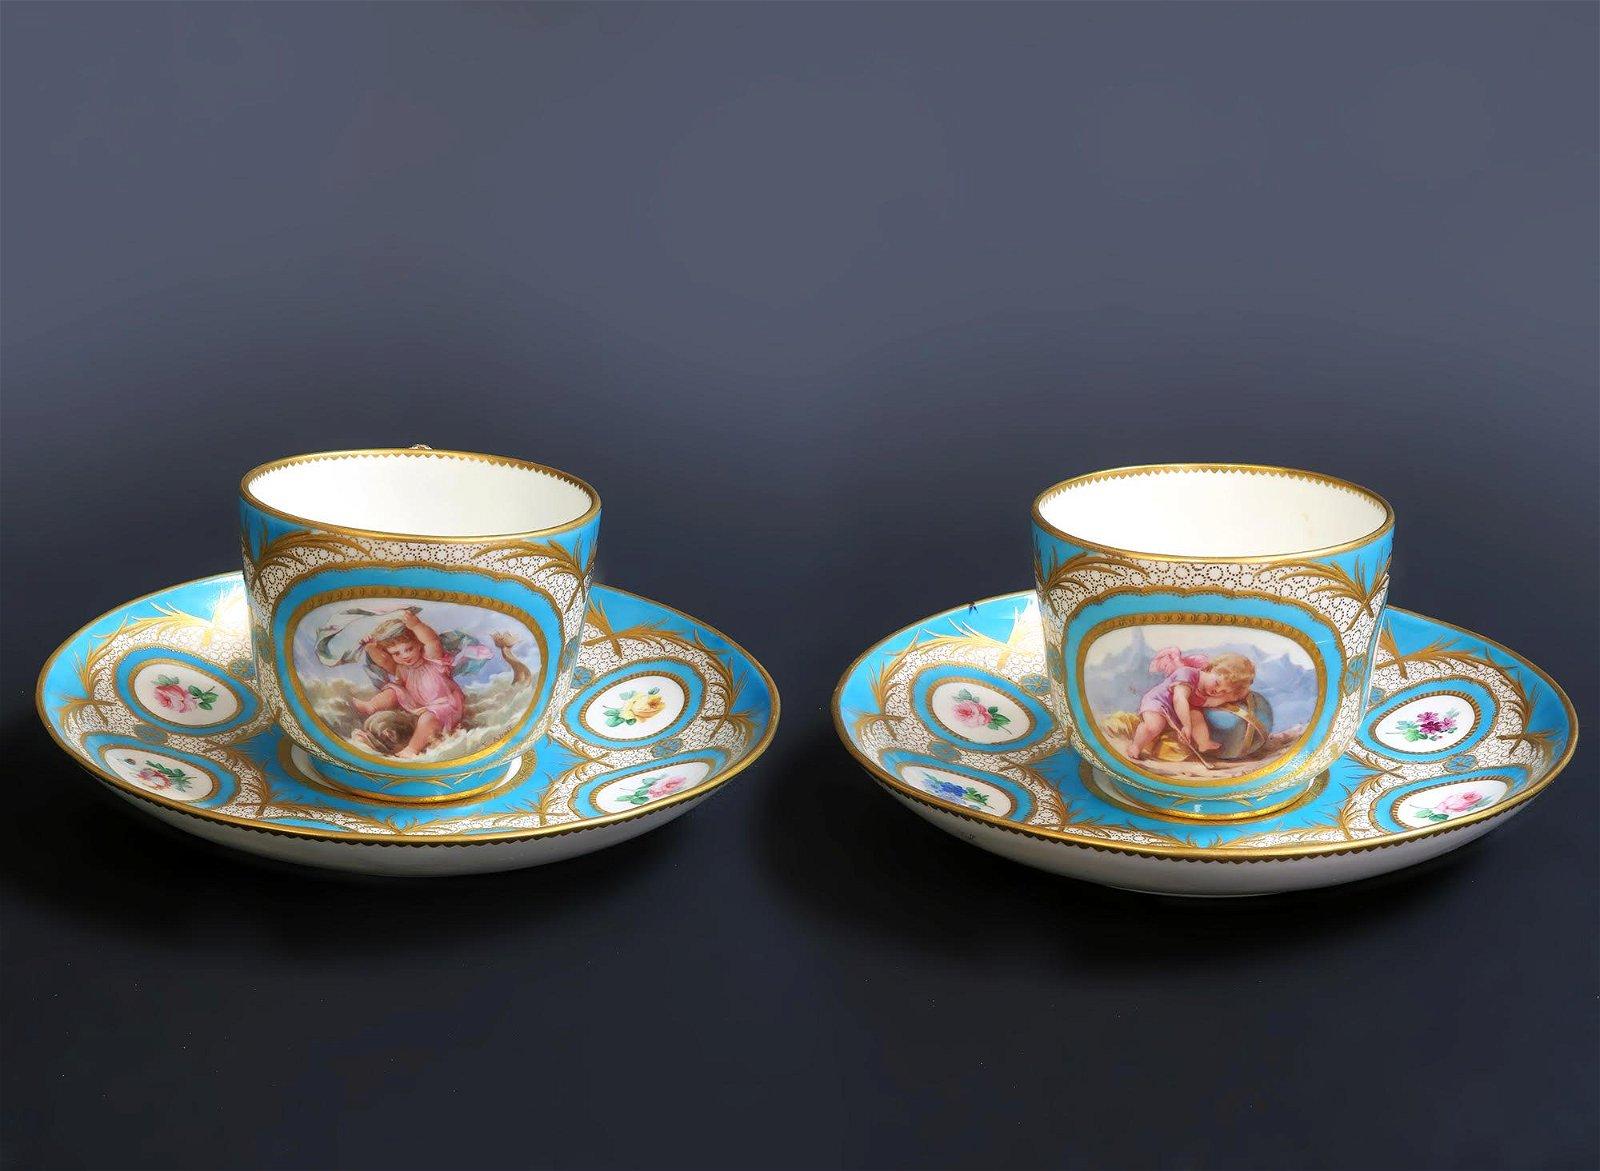 Pair of French Paris Porcelain Cup & Saucer